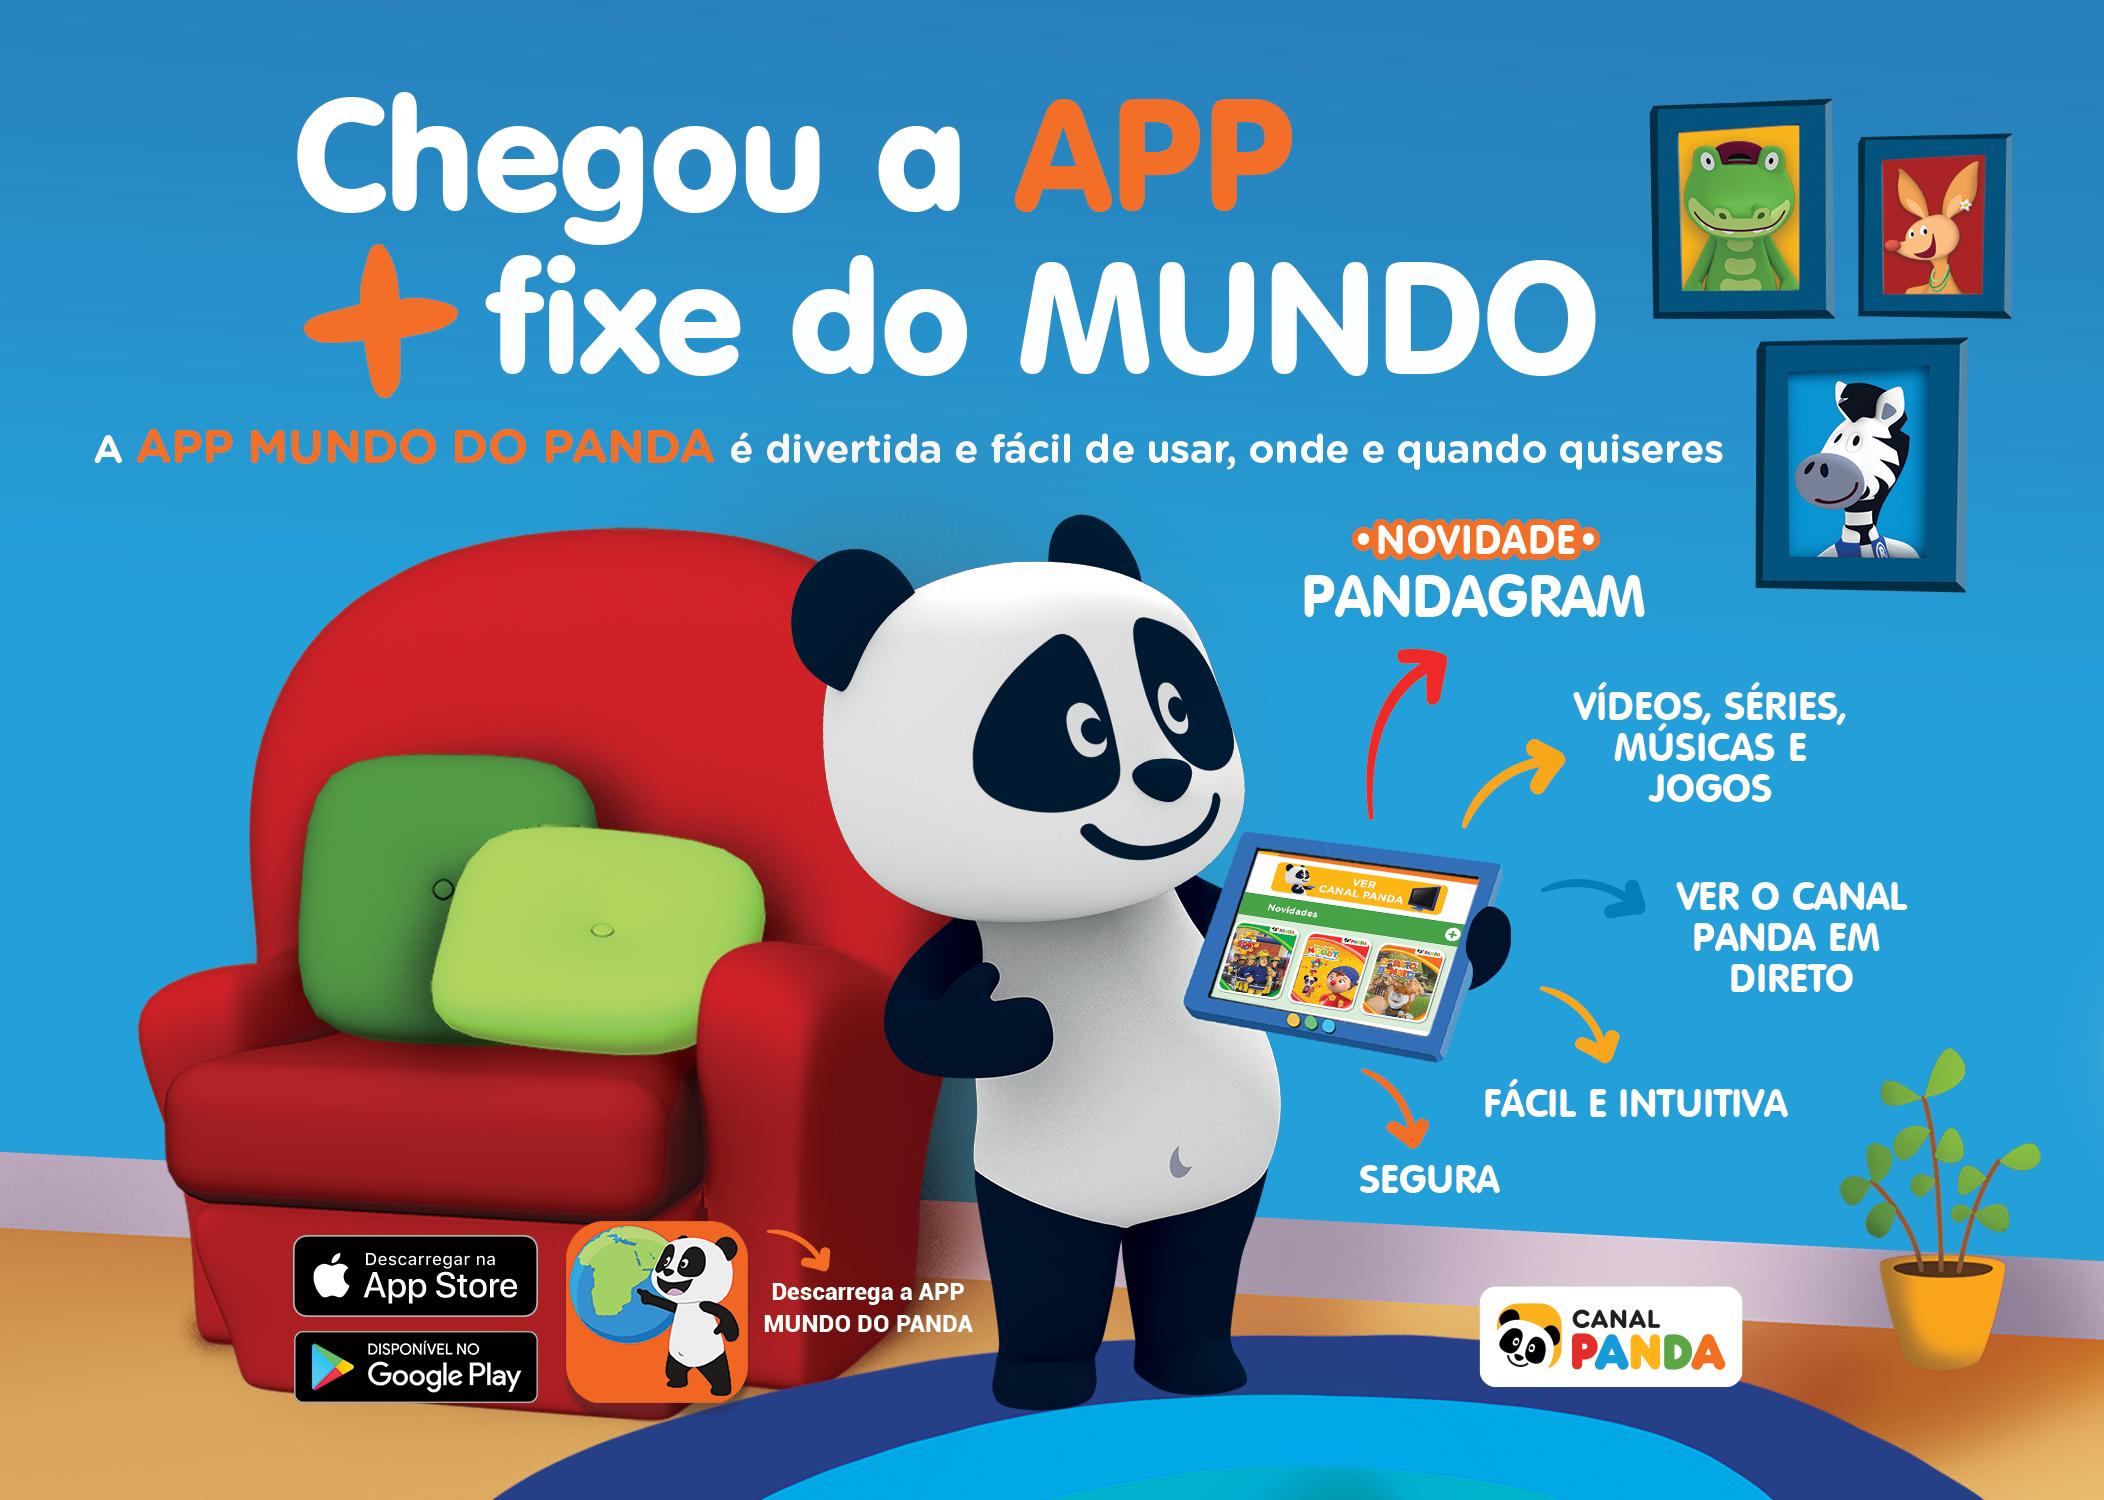 APP MUNDO DO PANDA